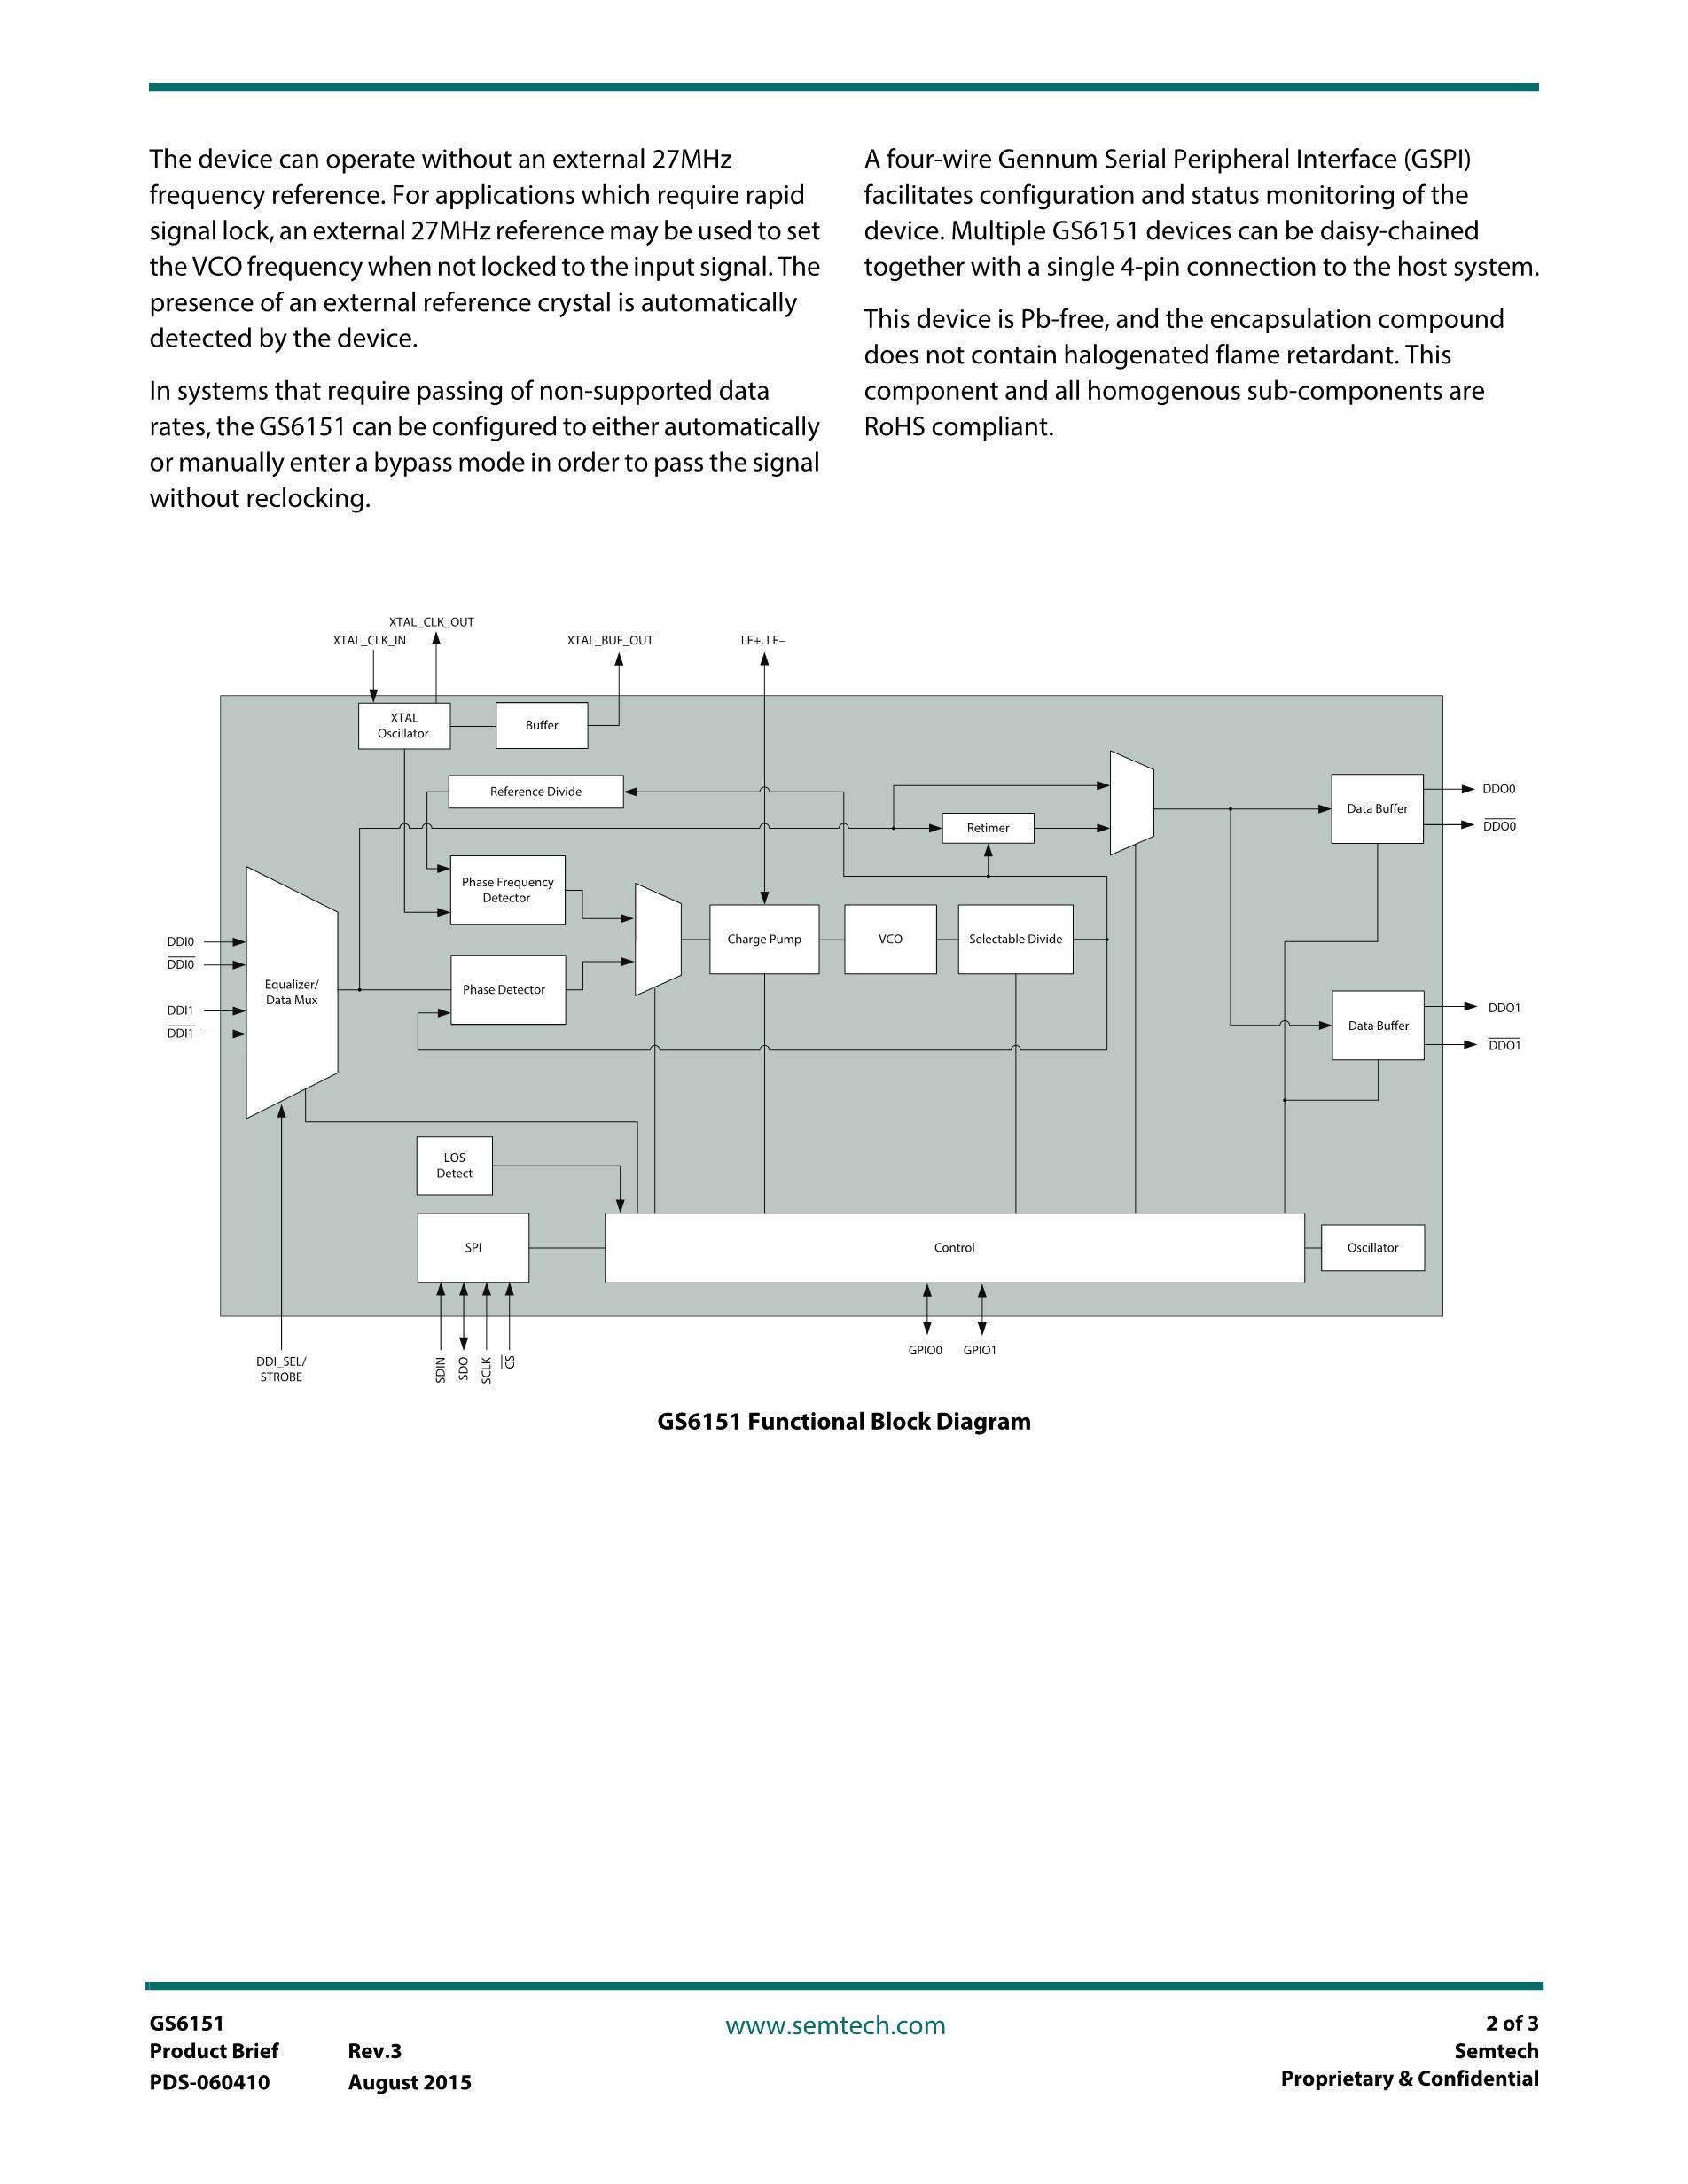 Intersil(Renesas Electronics) ISL33003IUZ's pdf picture 2